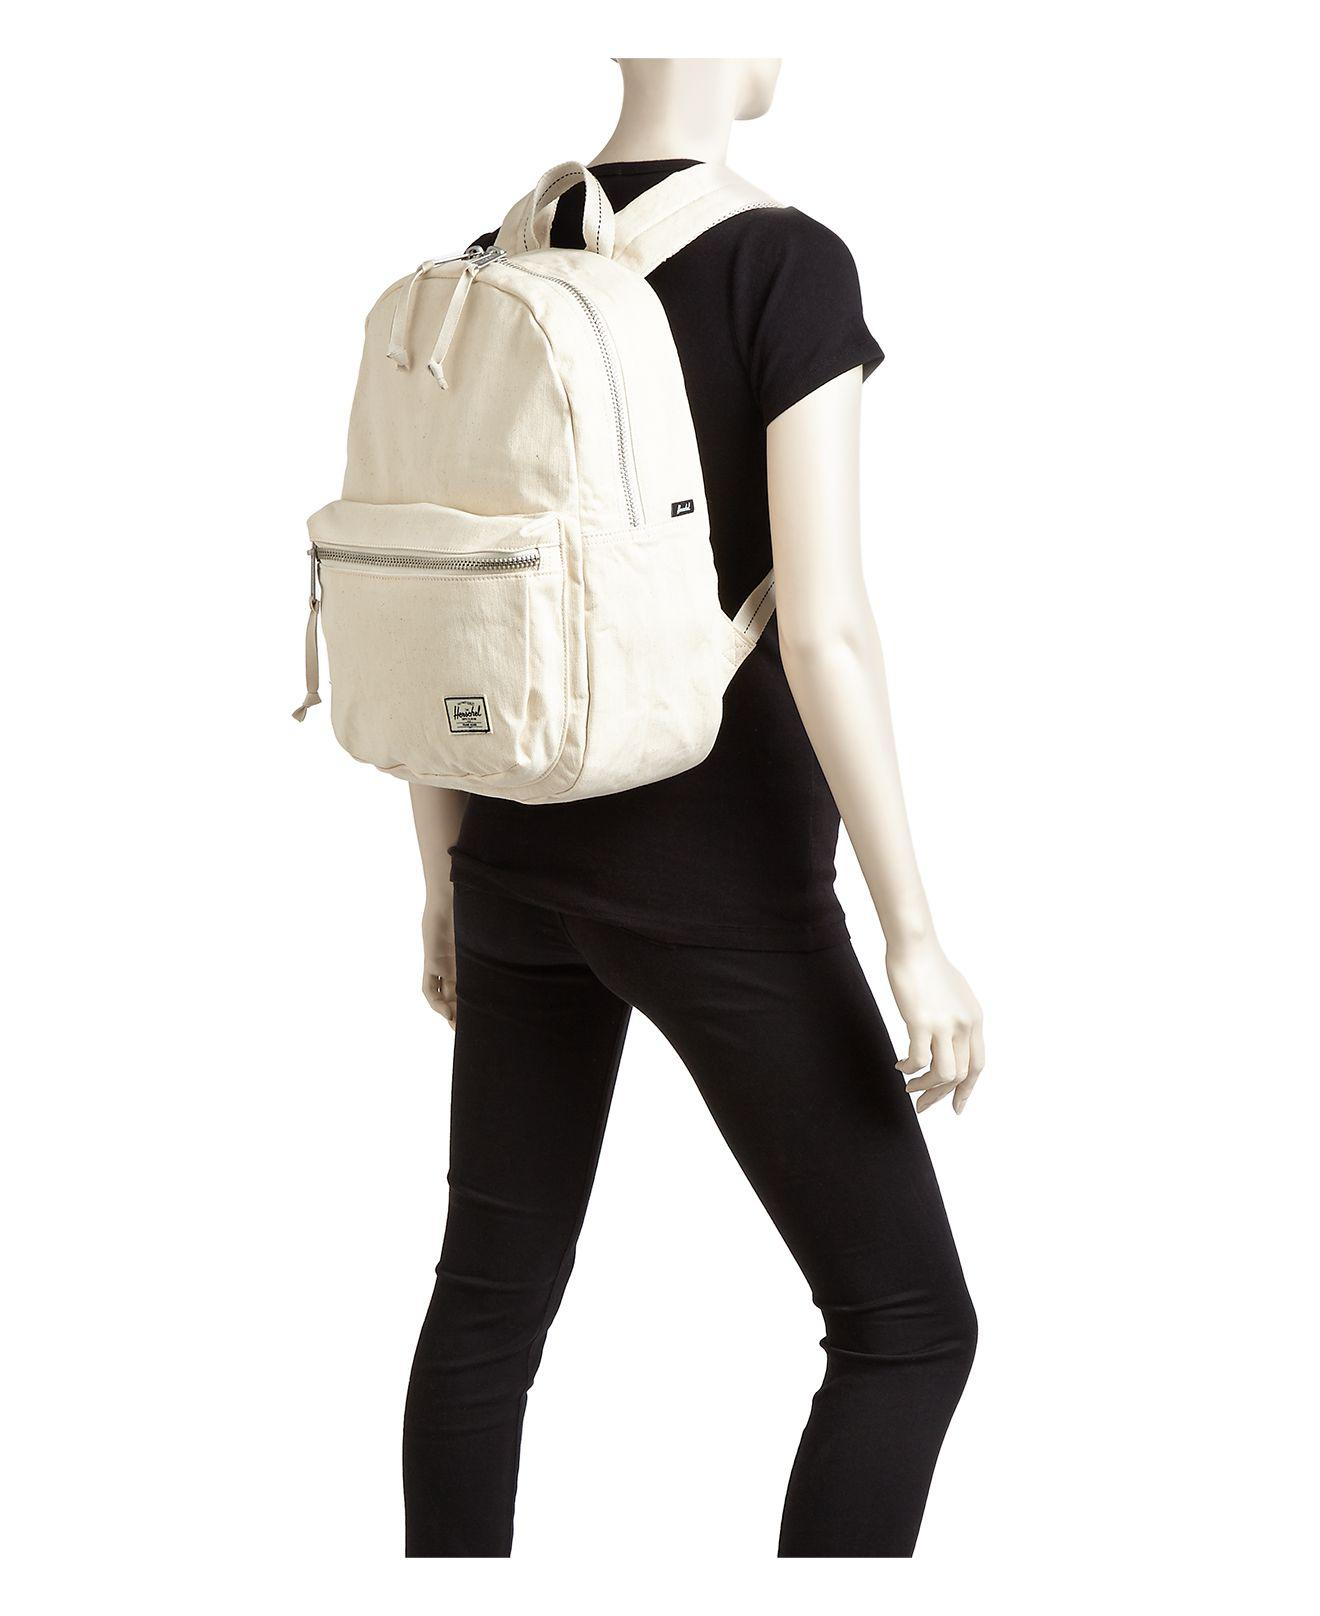 45ddb330ca5 Herschel Supply Co. Lawson Backpack - Lyst